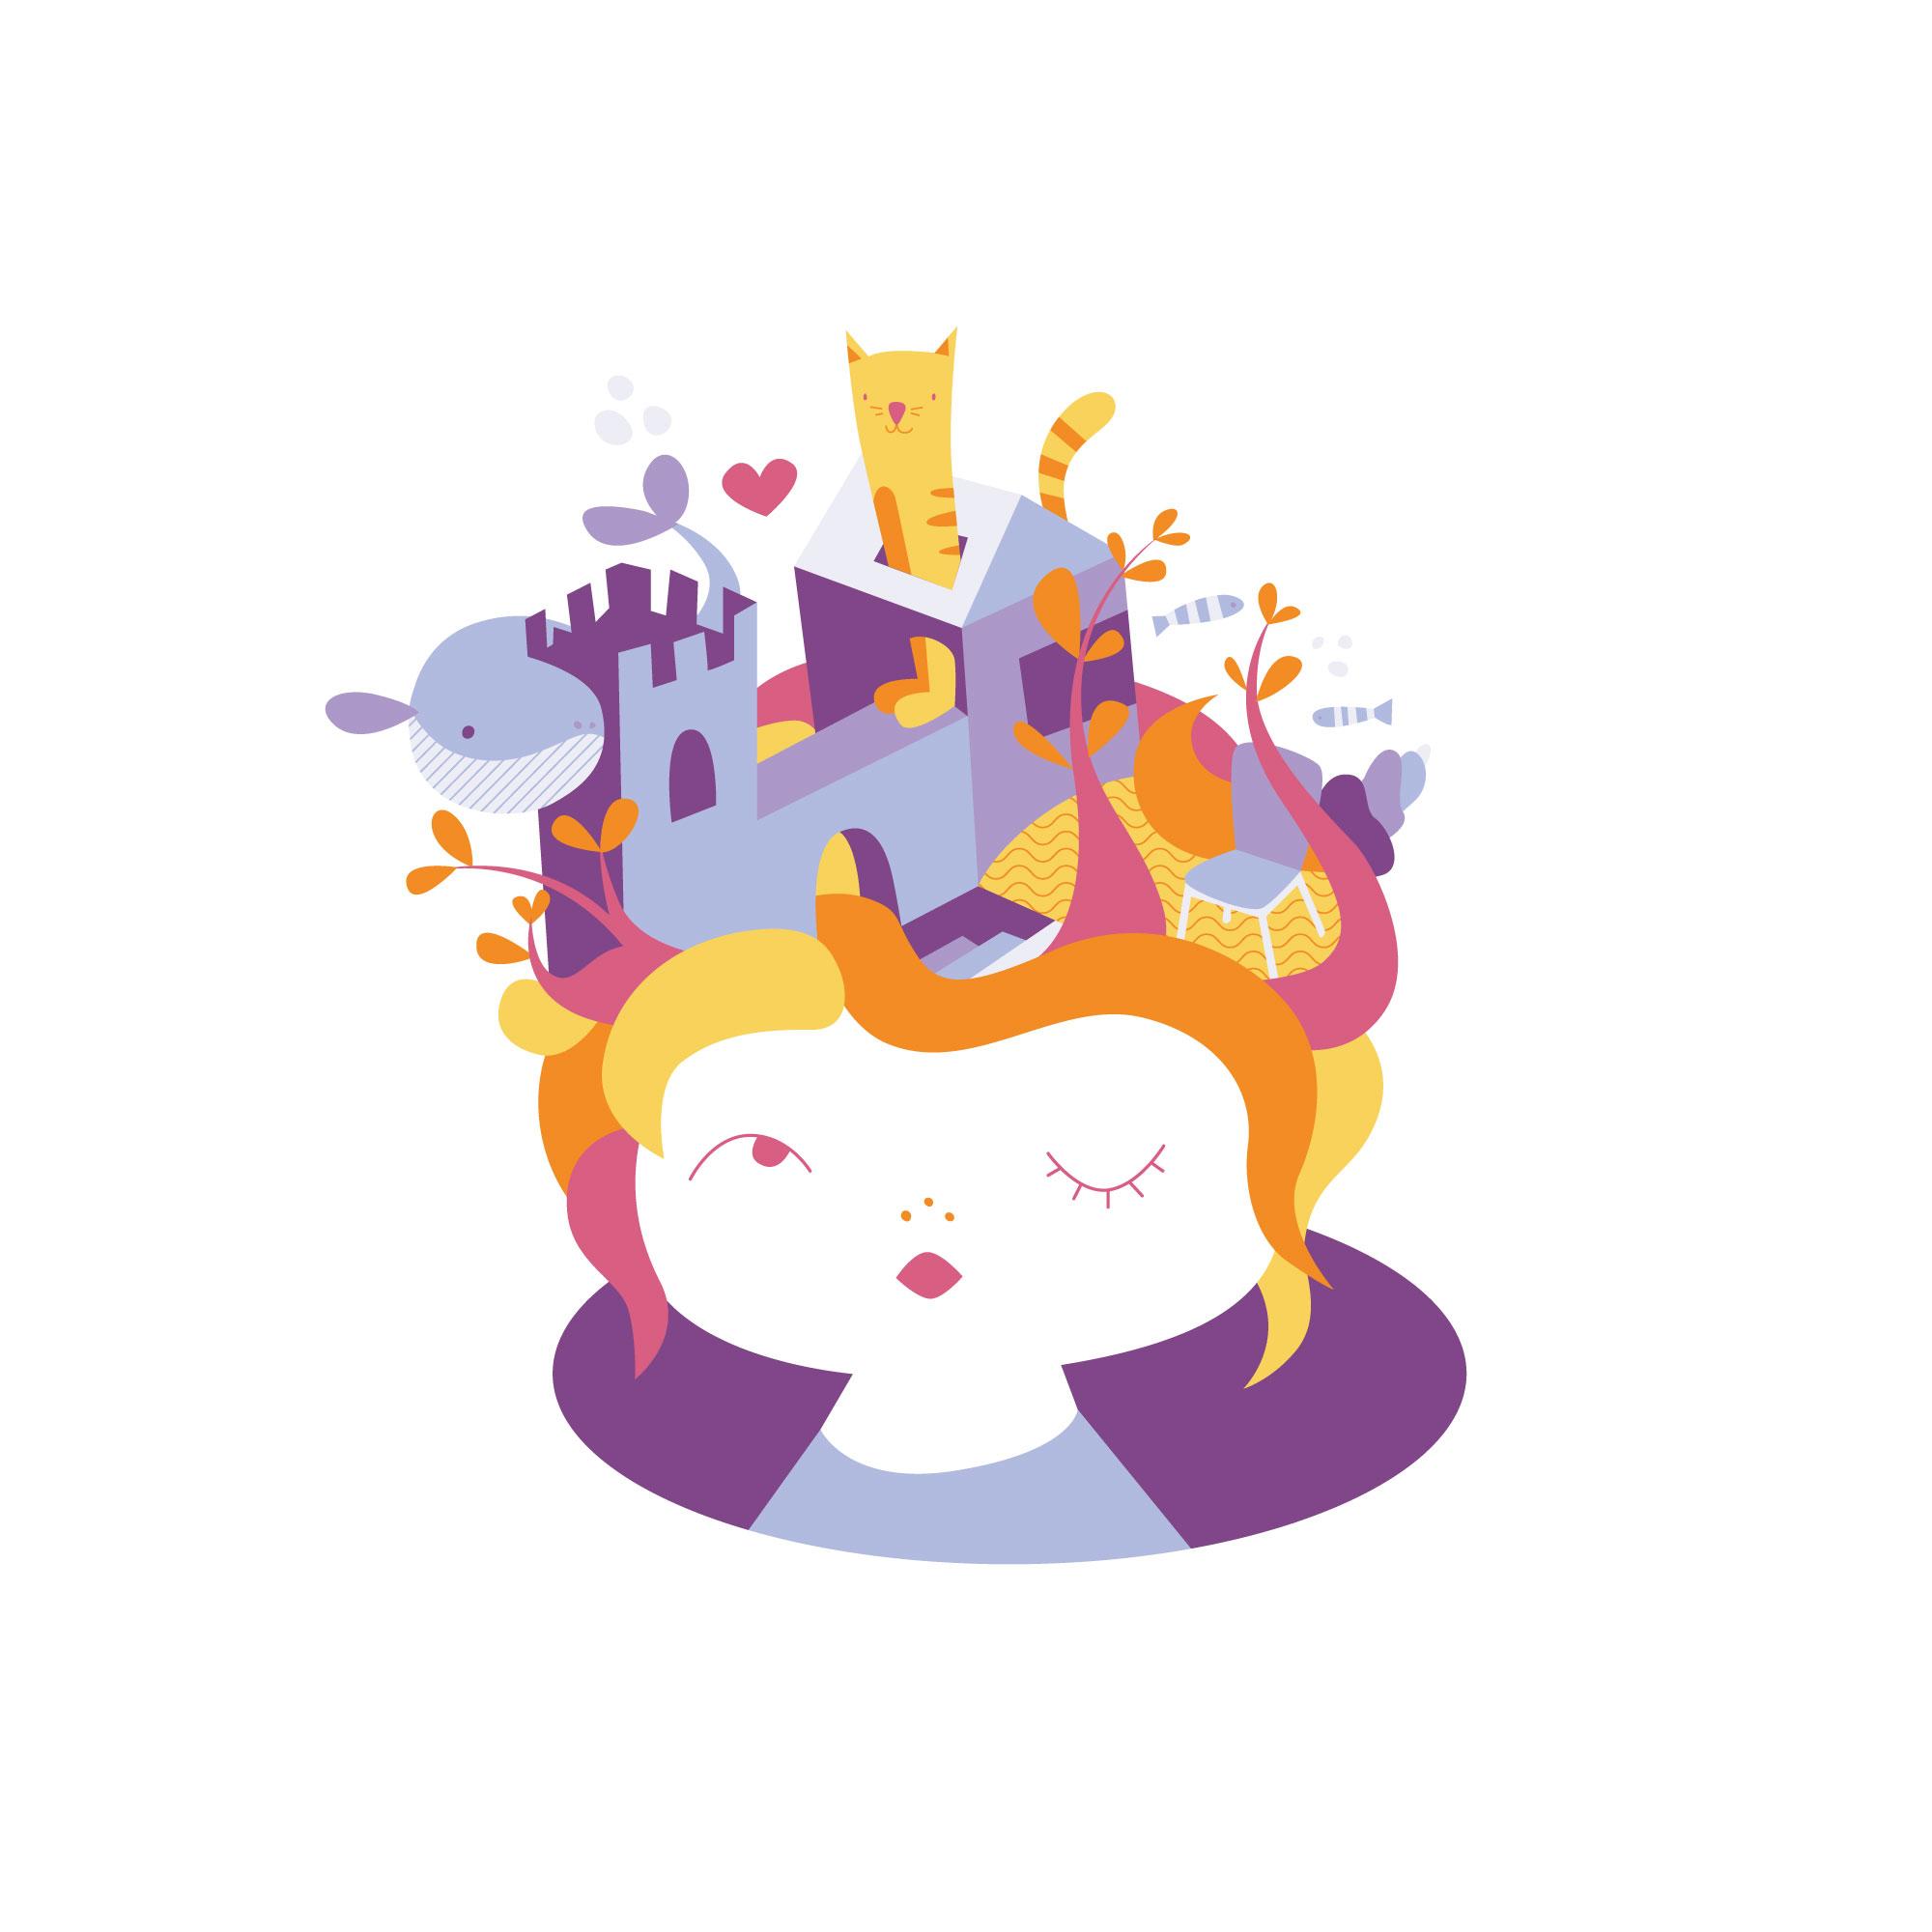 jacqueline_kaulfersch_illustration_dreams.jpg